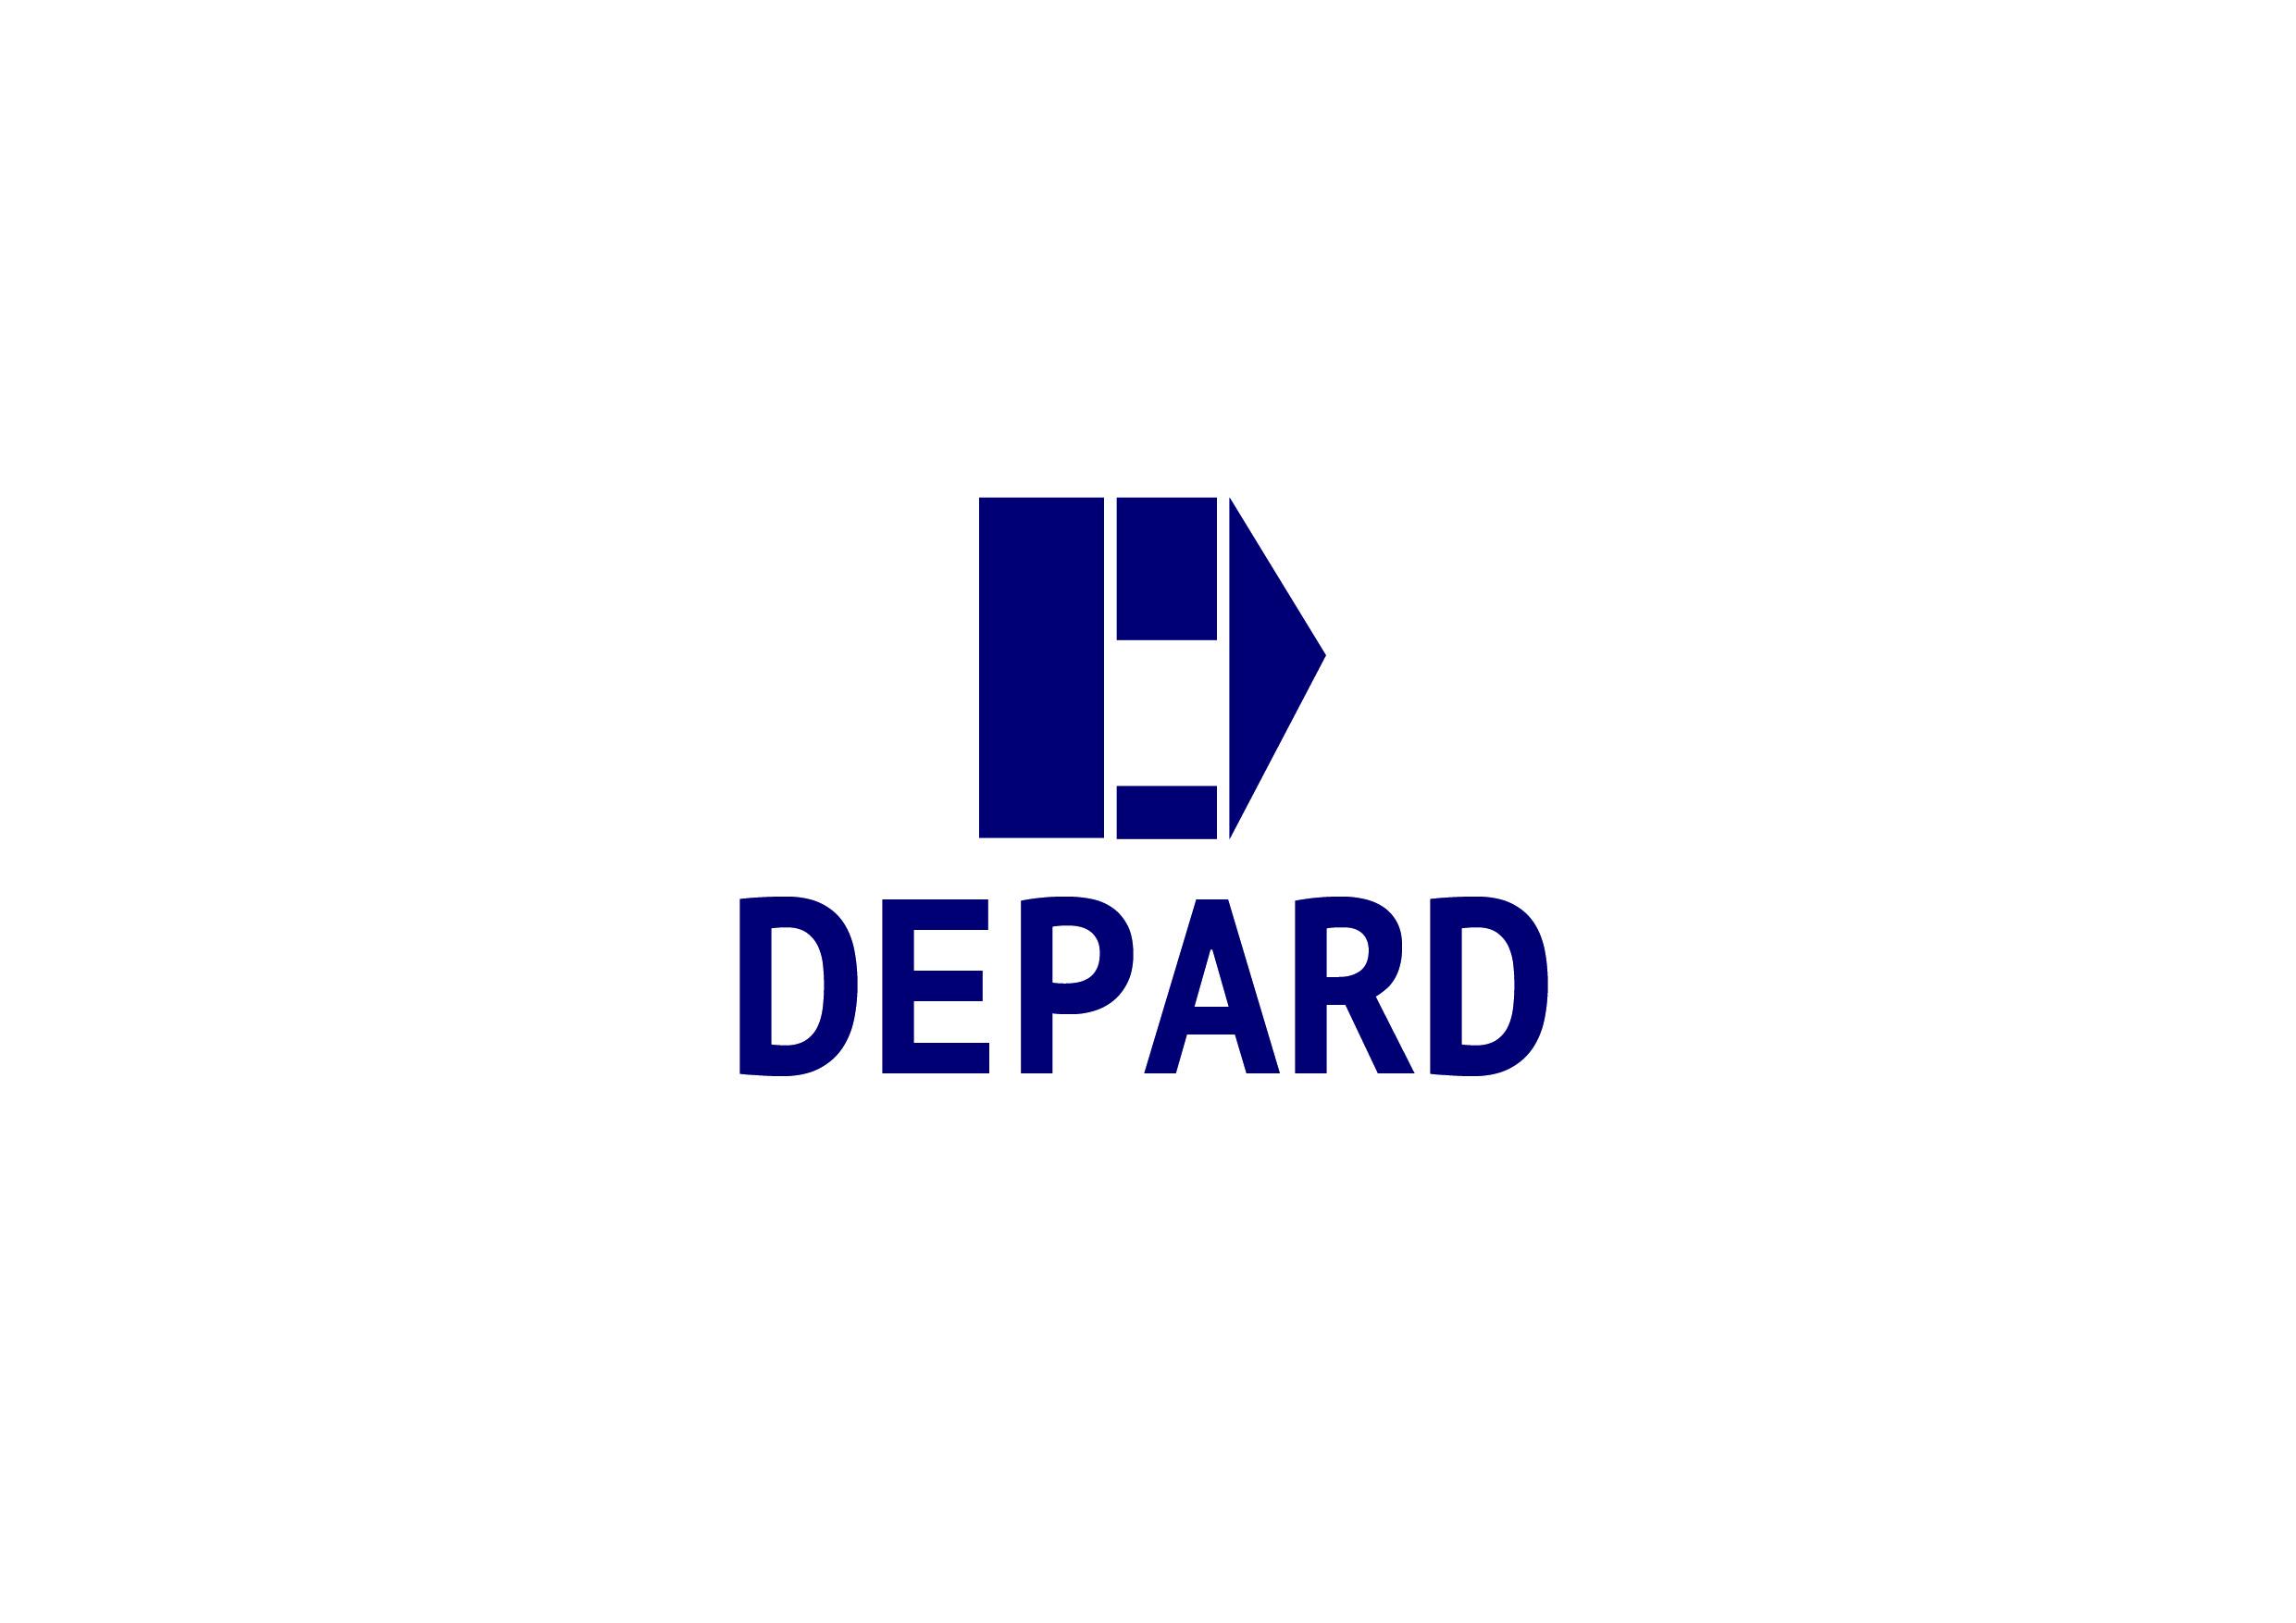 Логотип для компании (услуги недвижимость) фото f_9915930985fd6895.jpg